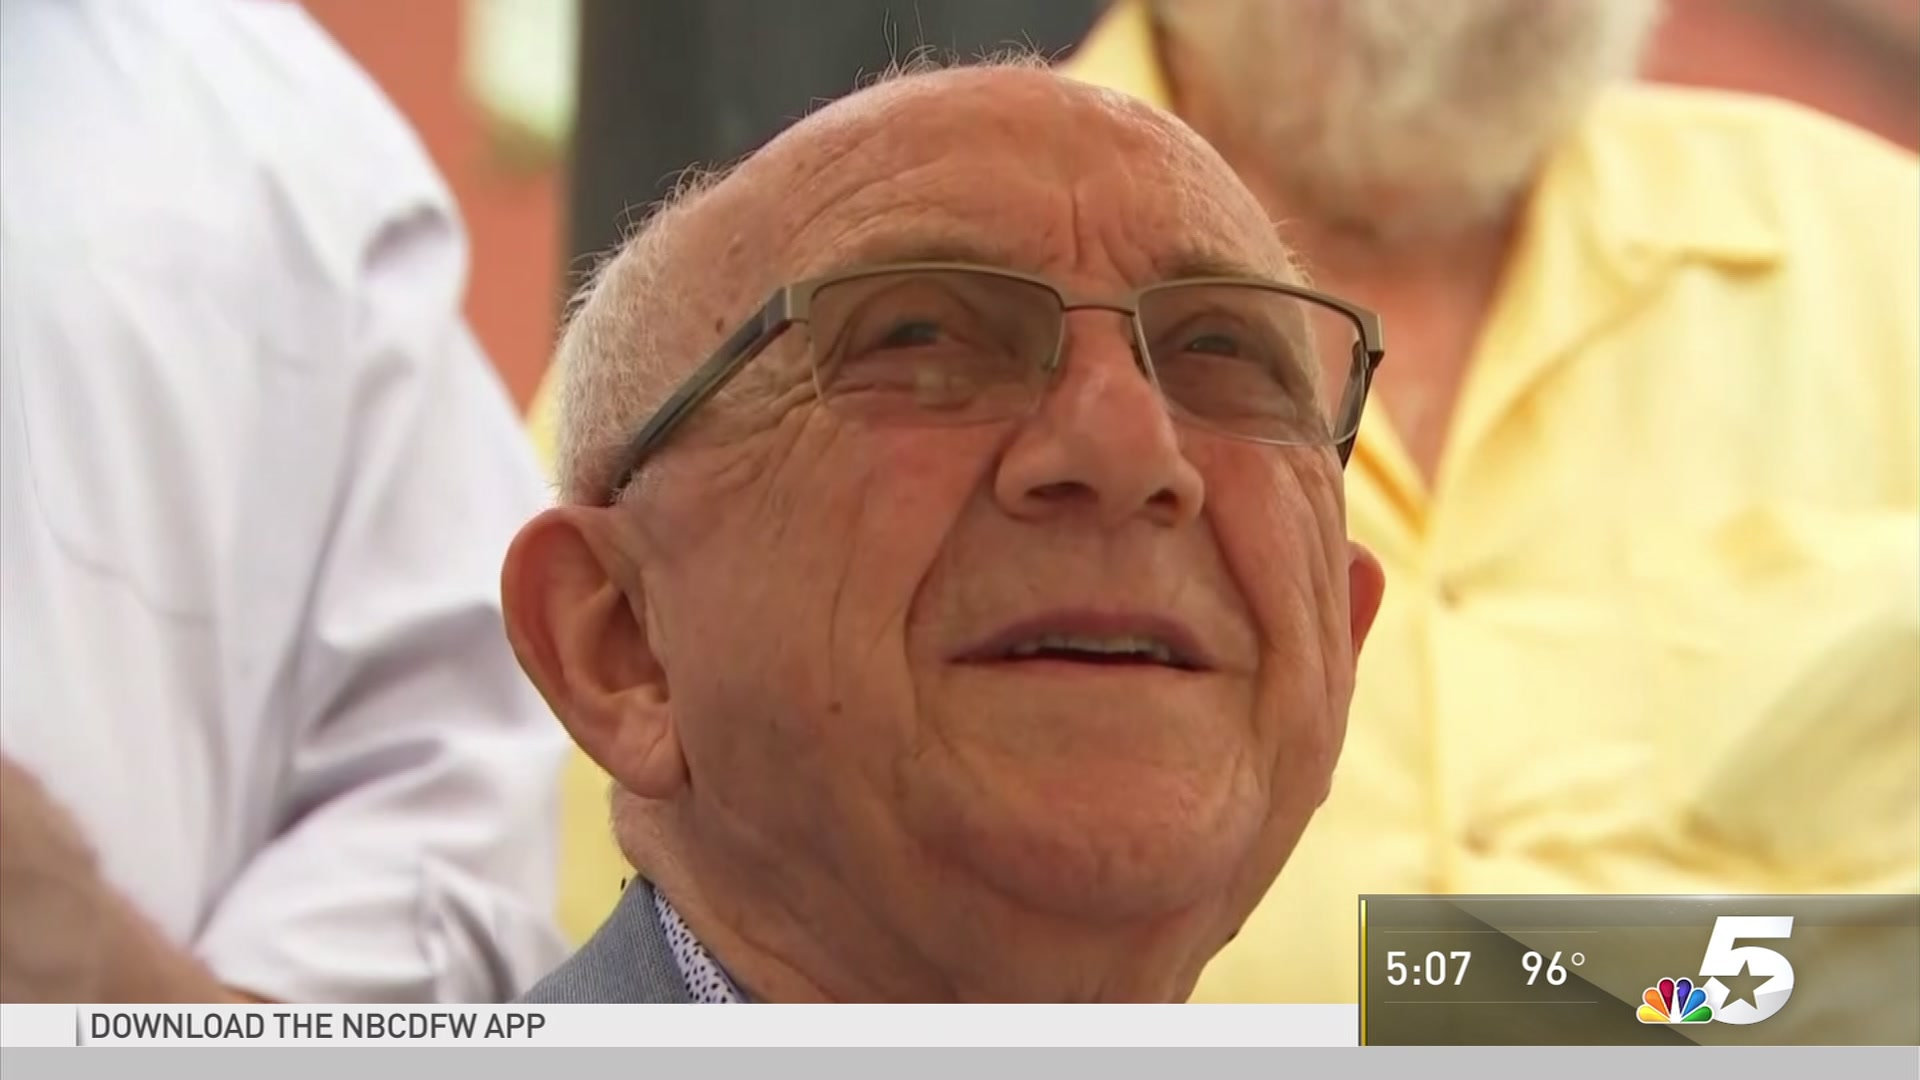 Dallas Holocaust Museum - NBC Channel 5 Coverage on the